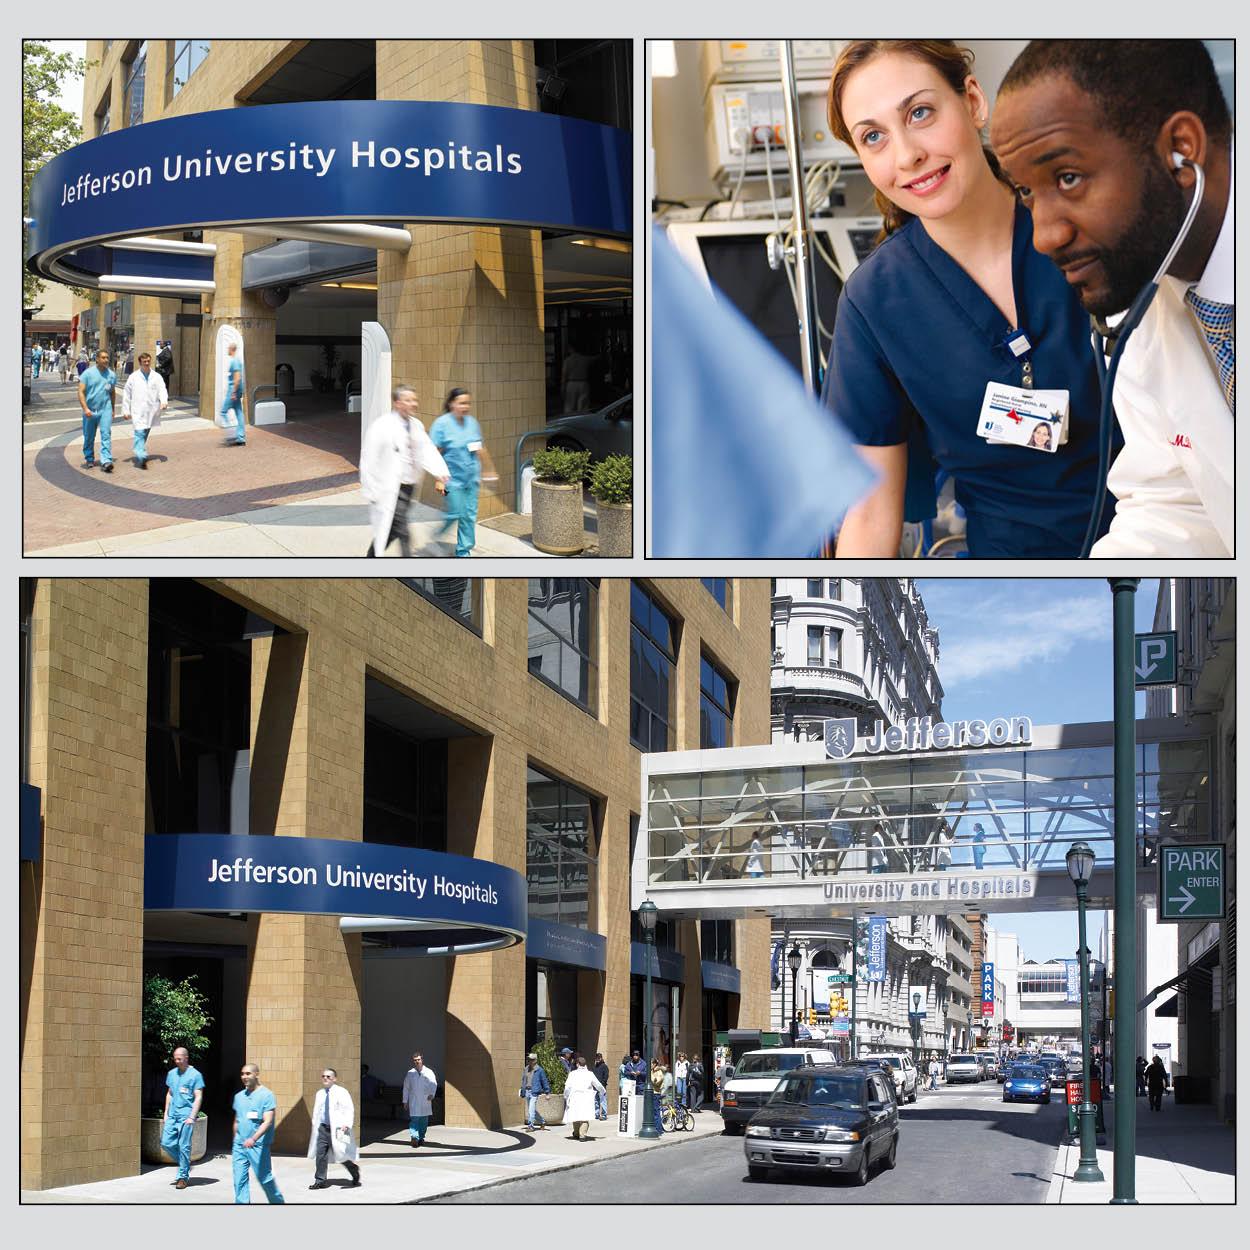 Thomas Jefferson University Hospital 100 Hospitals